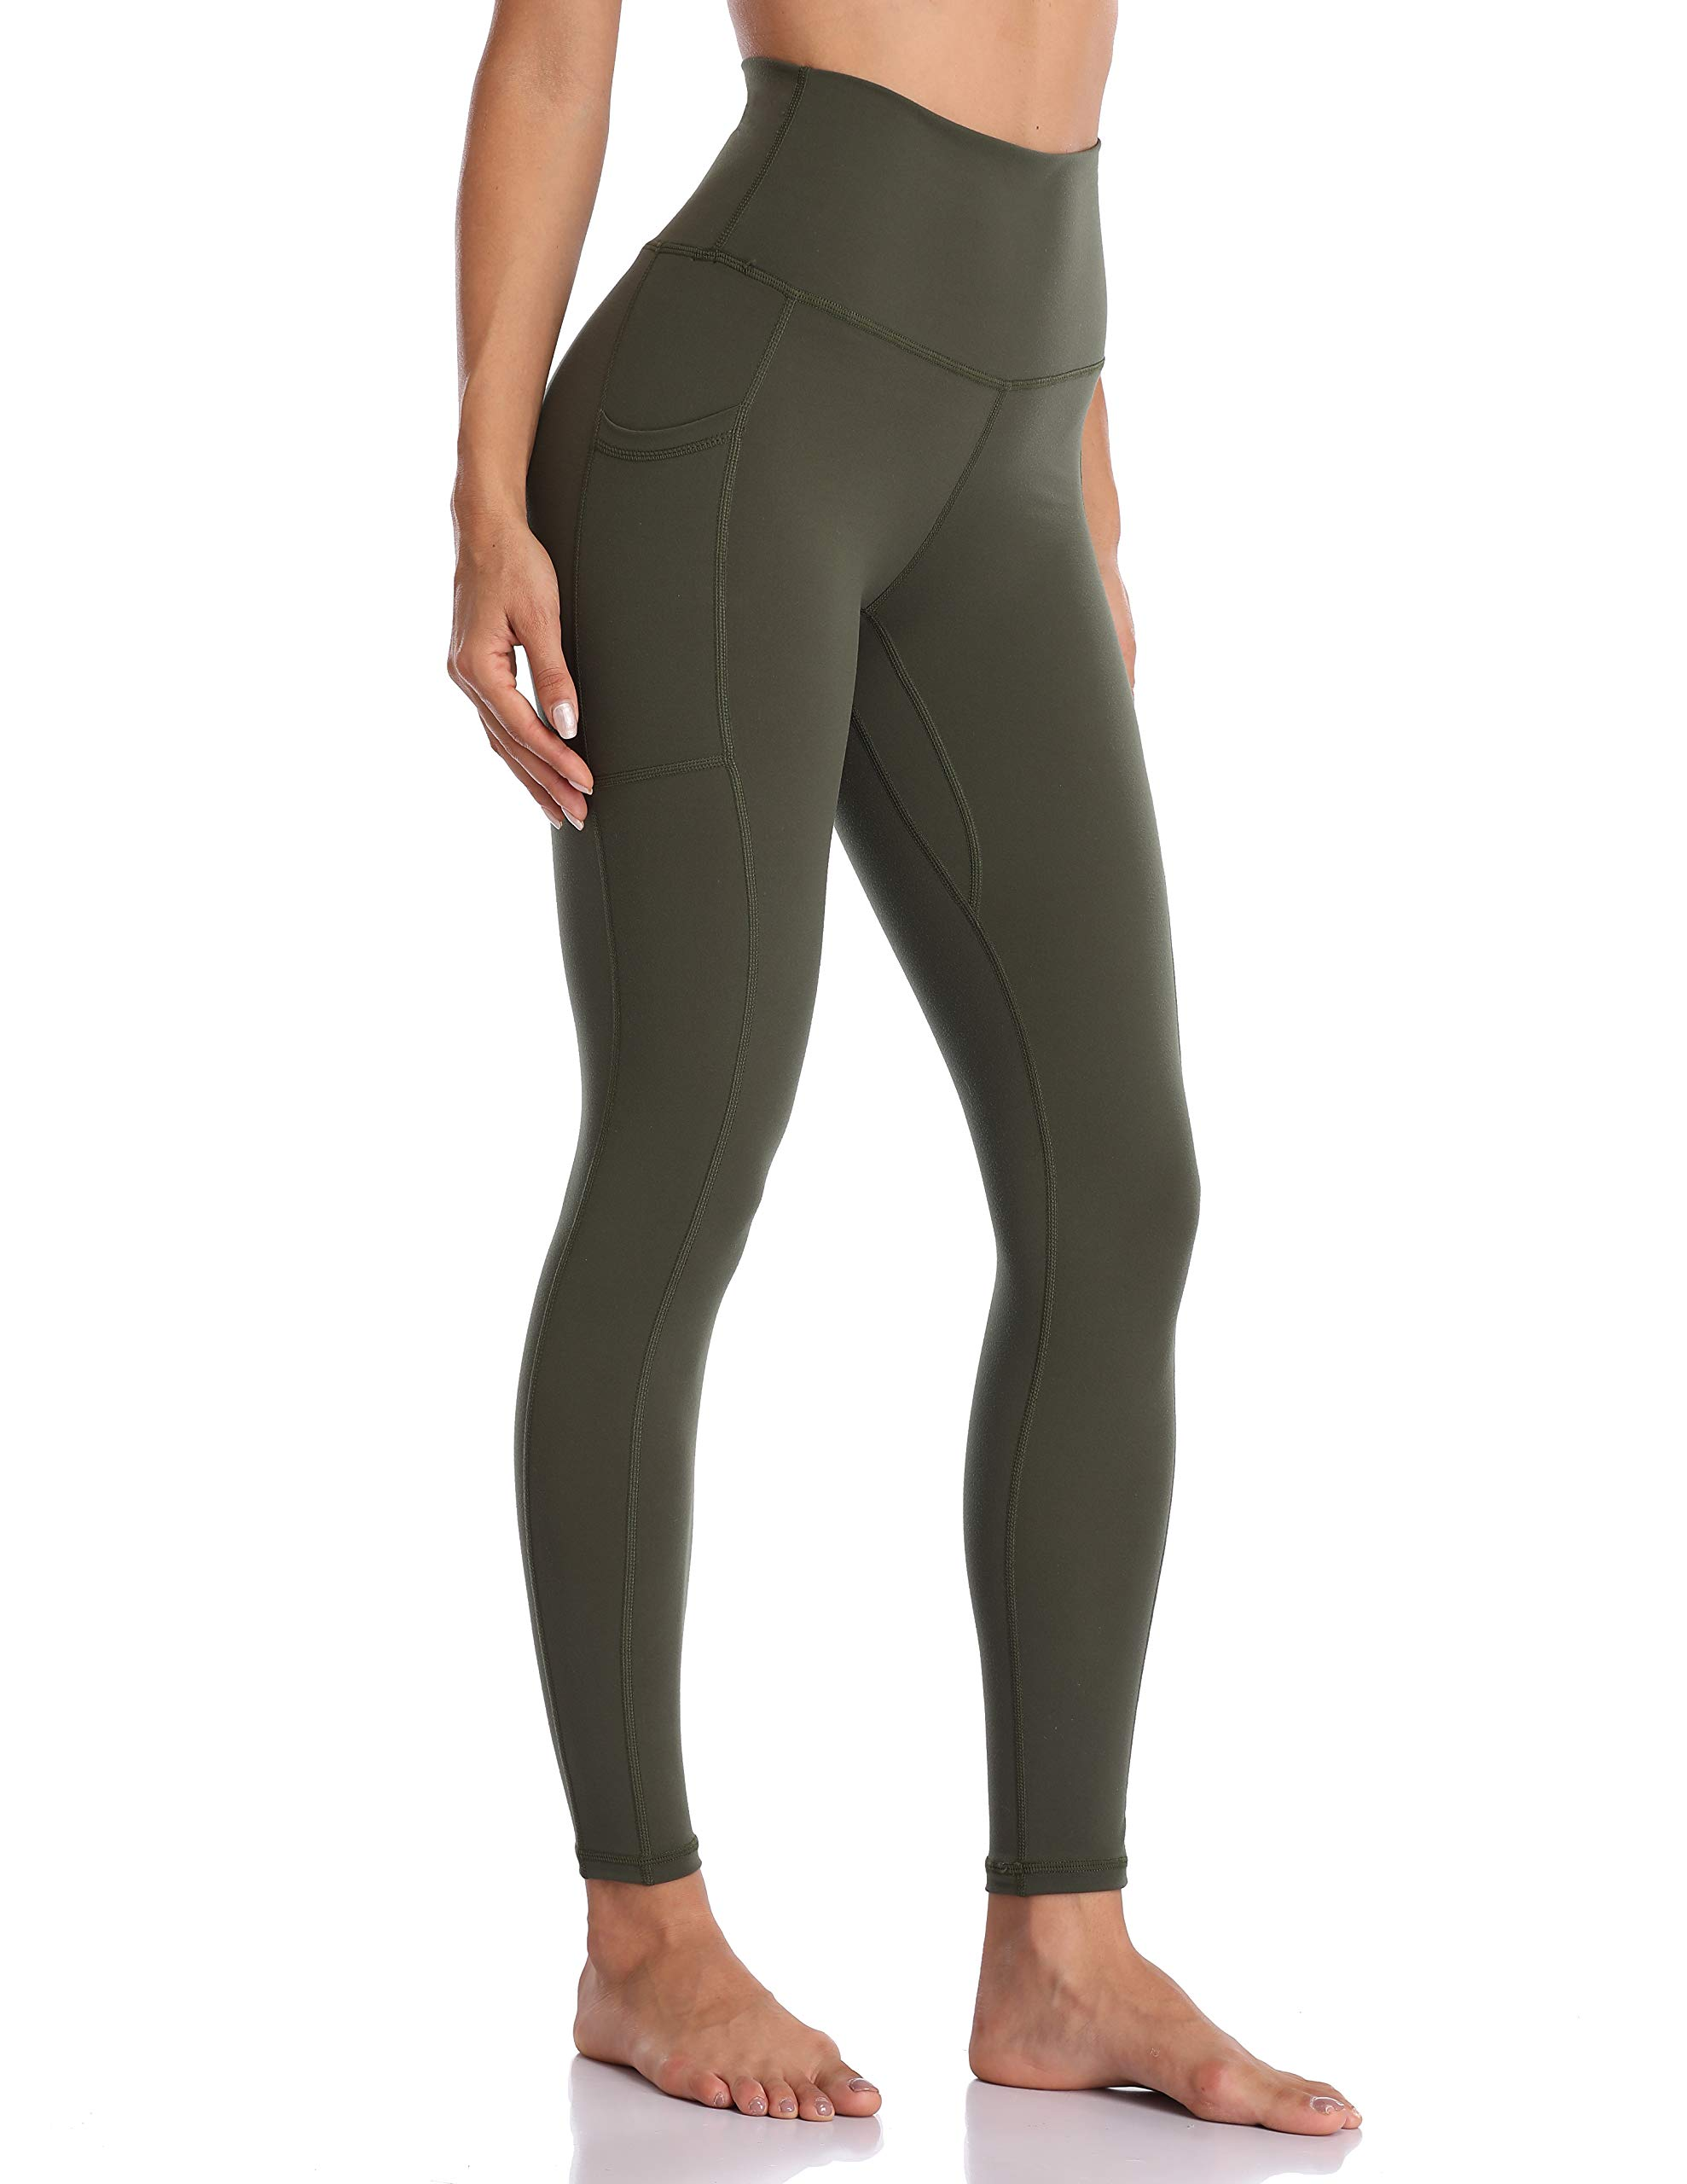 Colorfulkoala Women's High Waisted Yoga Pants 7/8 Length Leggings with Pockets(XL, Olive Green) by Colorfulkoala